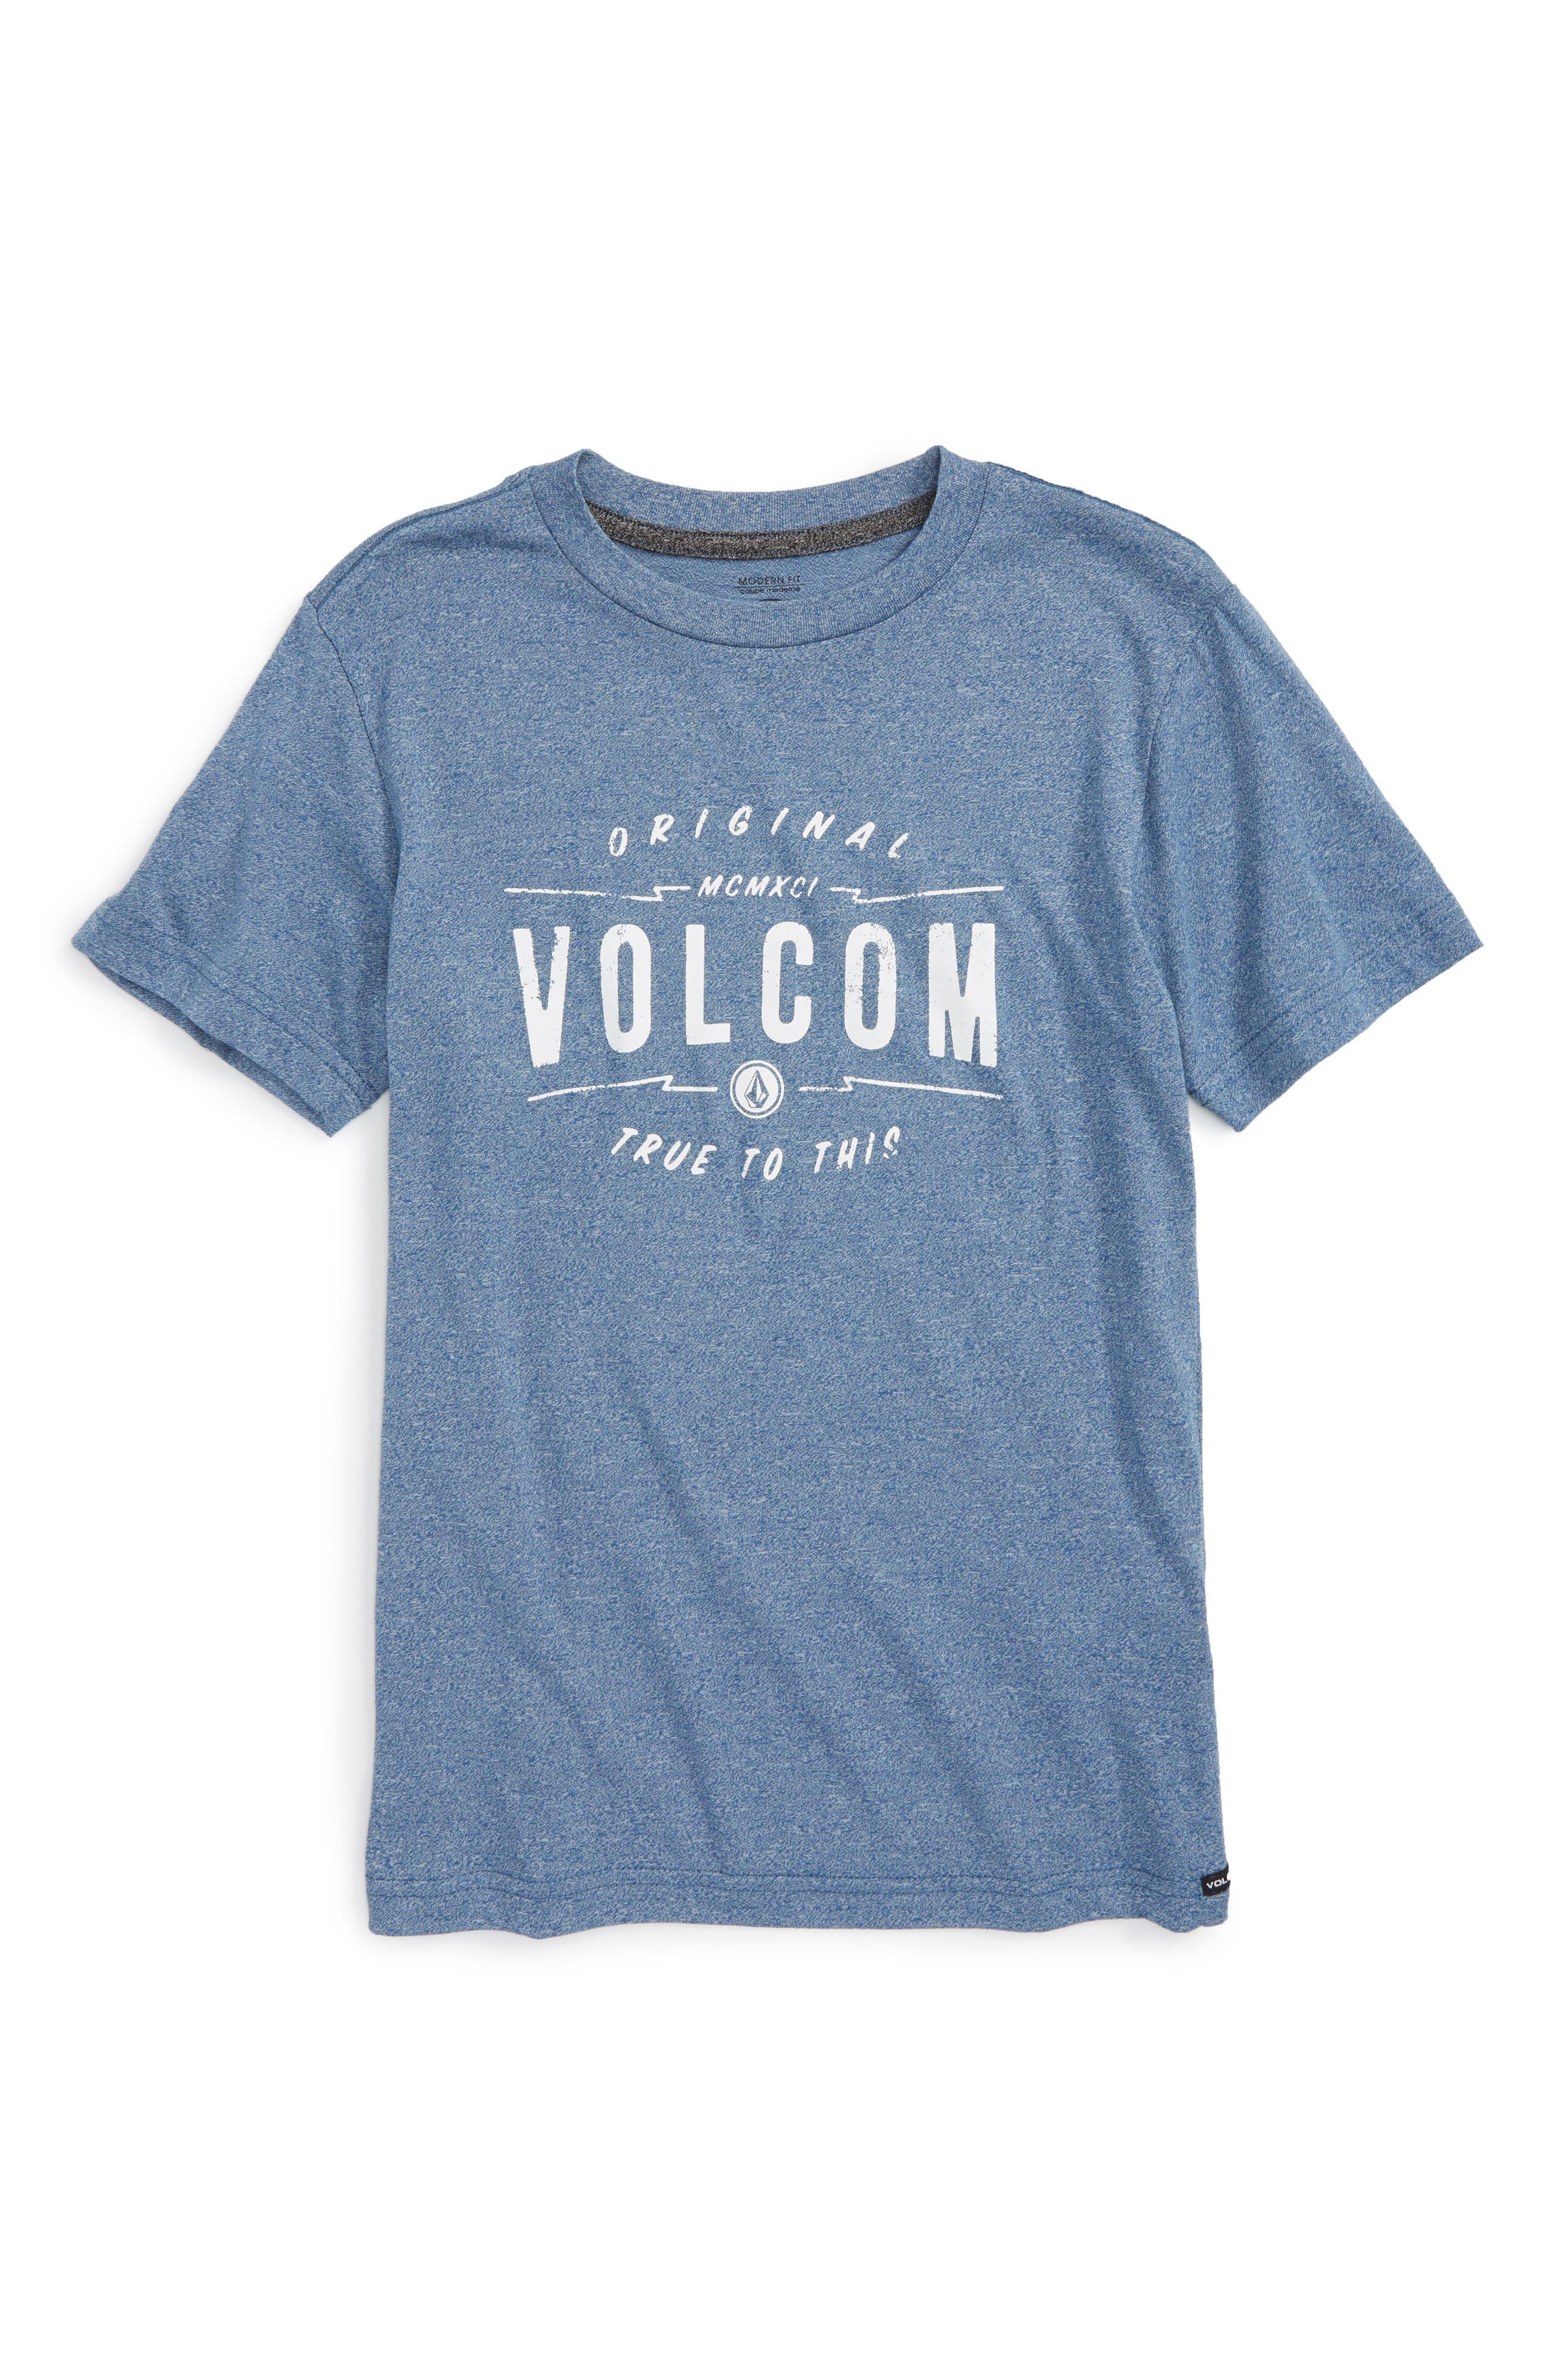 Volcom Garage Club T-Shirt (Toddler Boys, Little Boys & Big Boys)